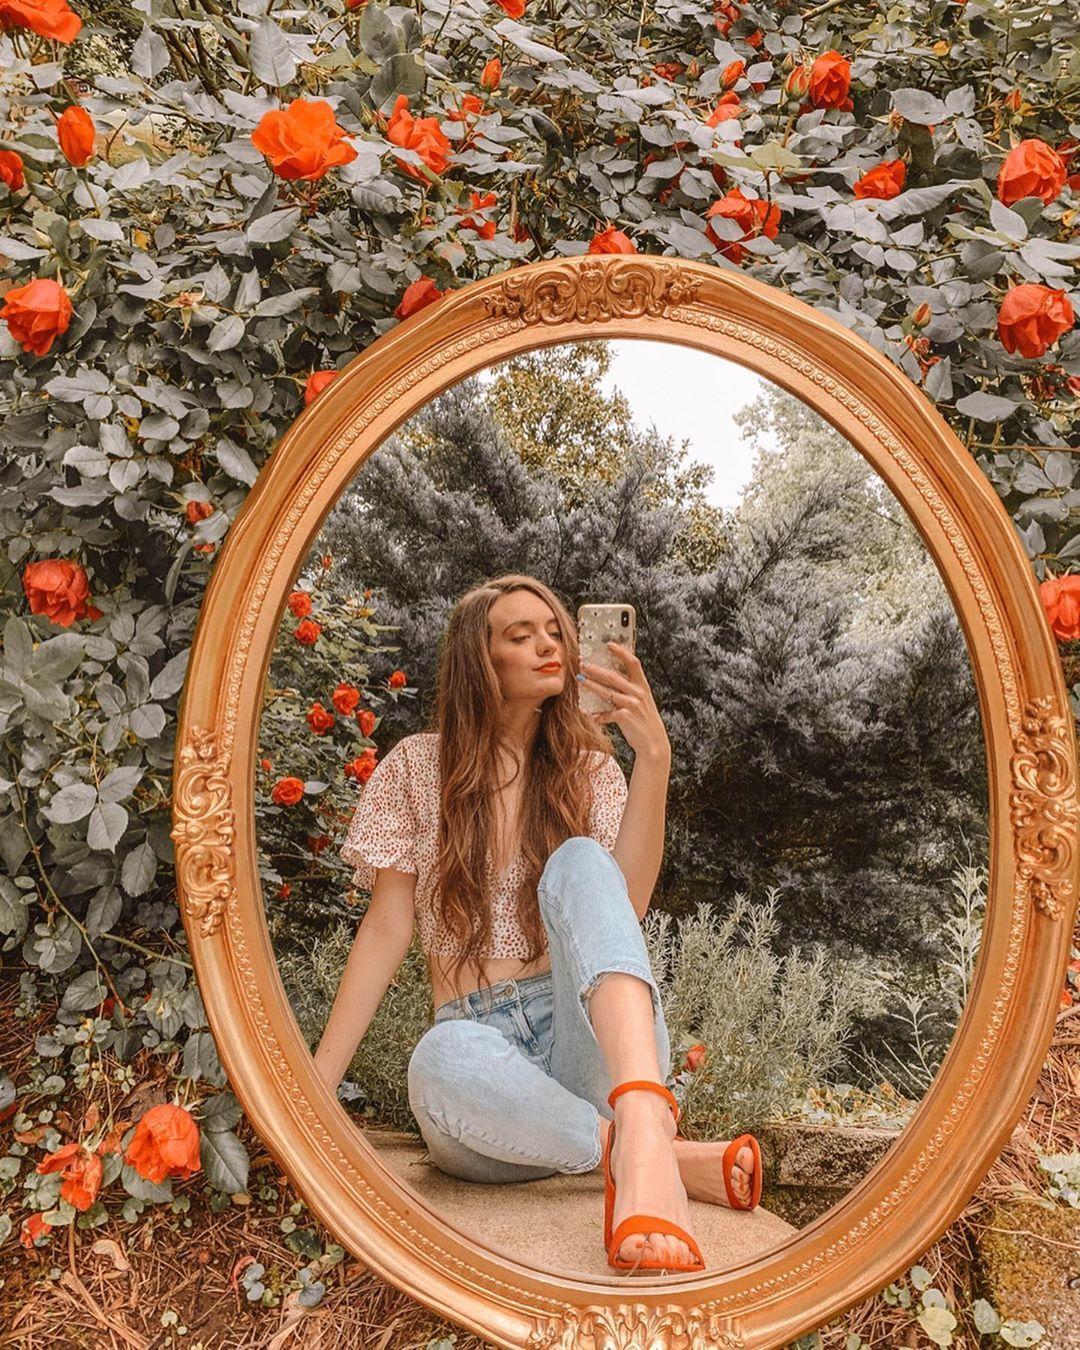 Chic Outside Mirror Selfie Trend Inspo Tiktok Trends Instagram Ideas Photography Instagram Photo Inspiration Creative Portrait Photography